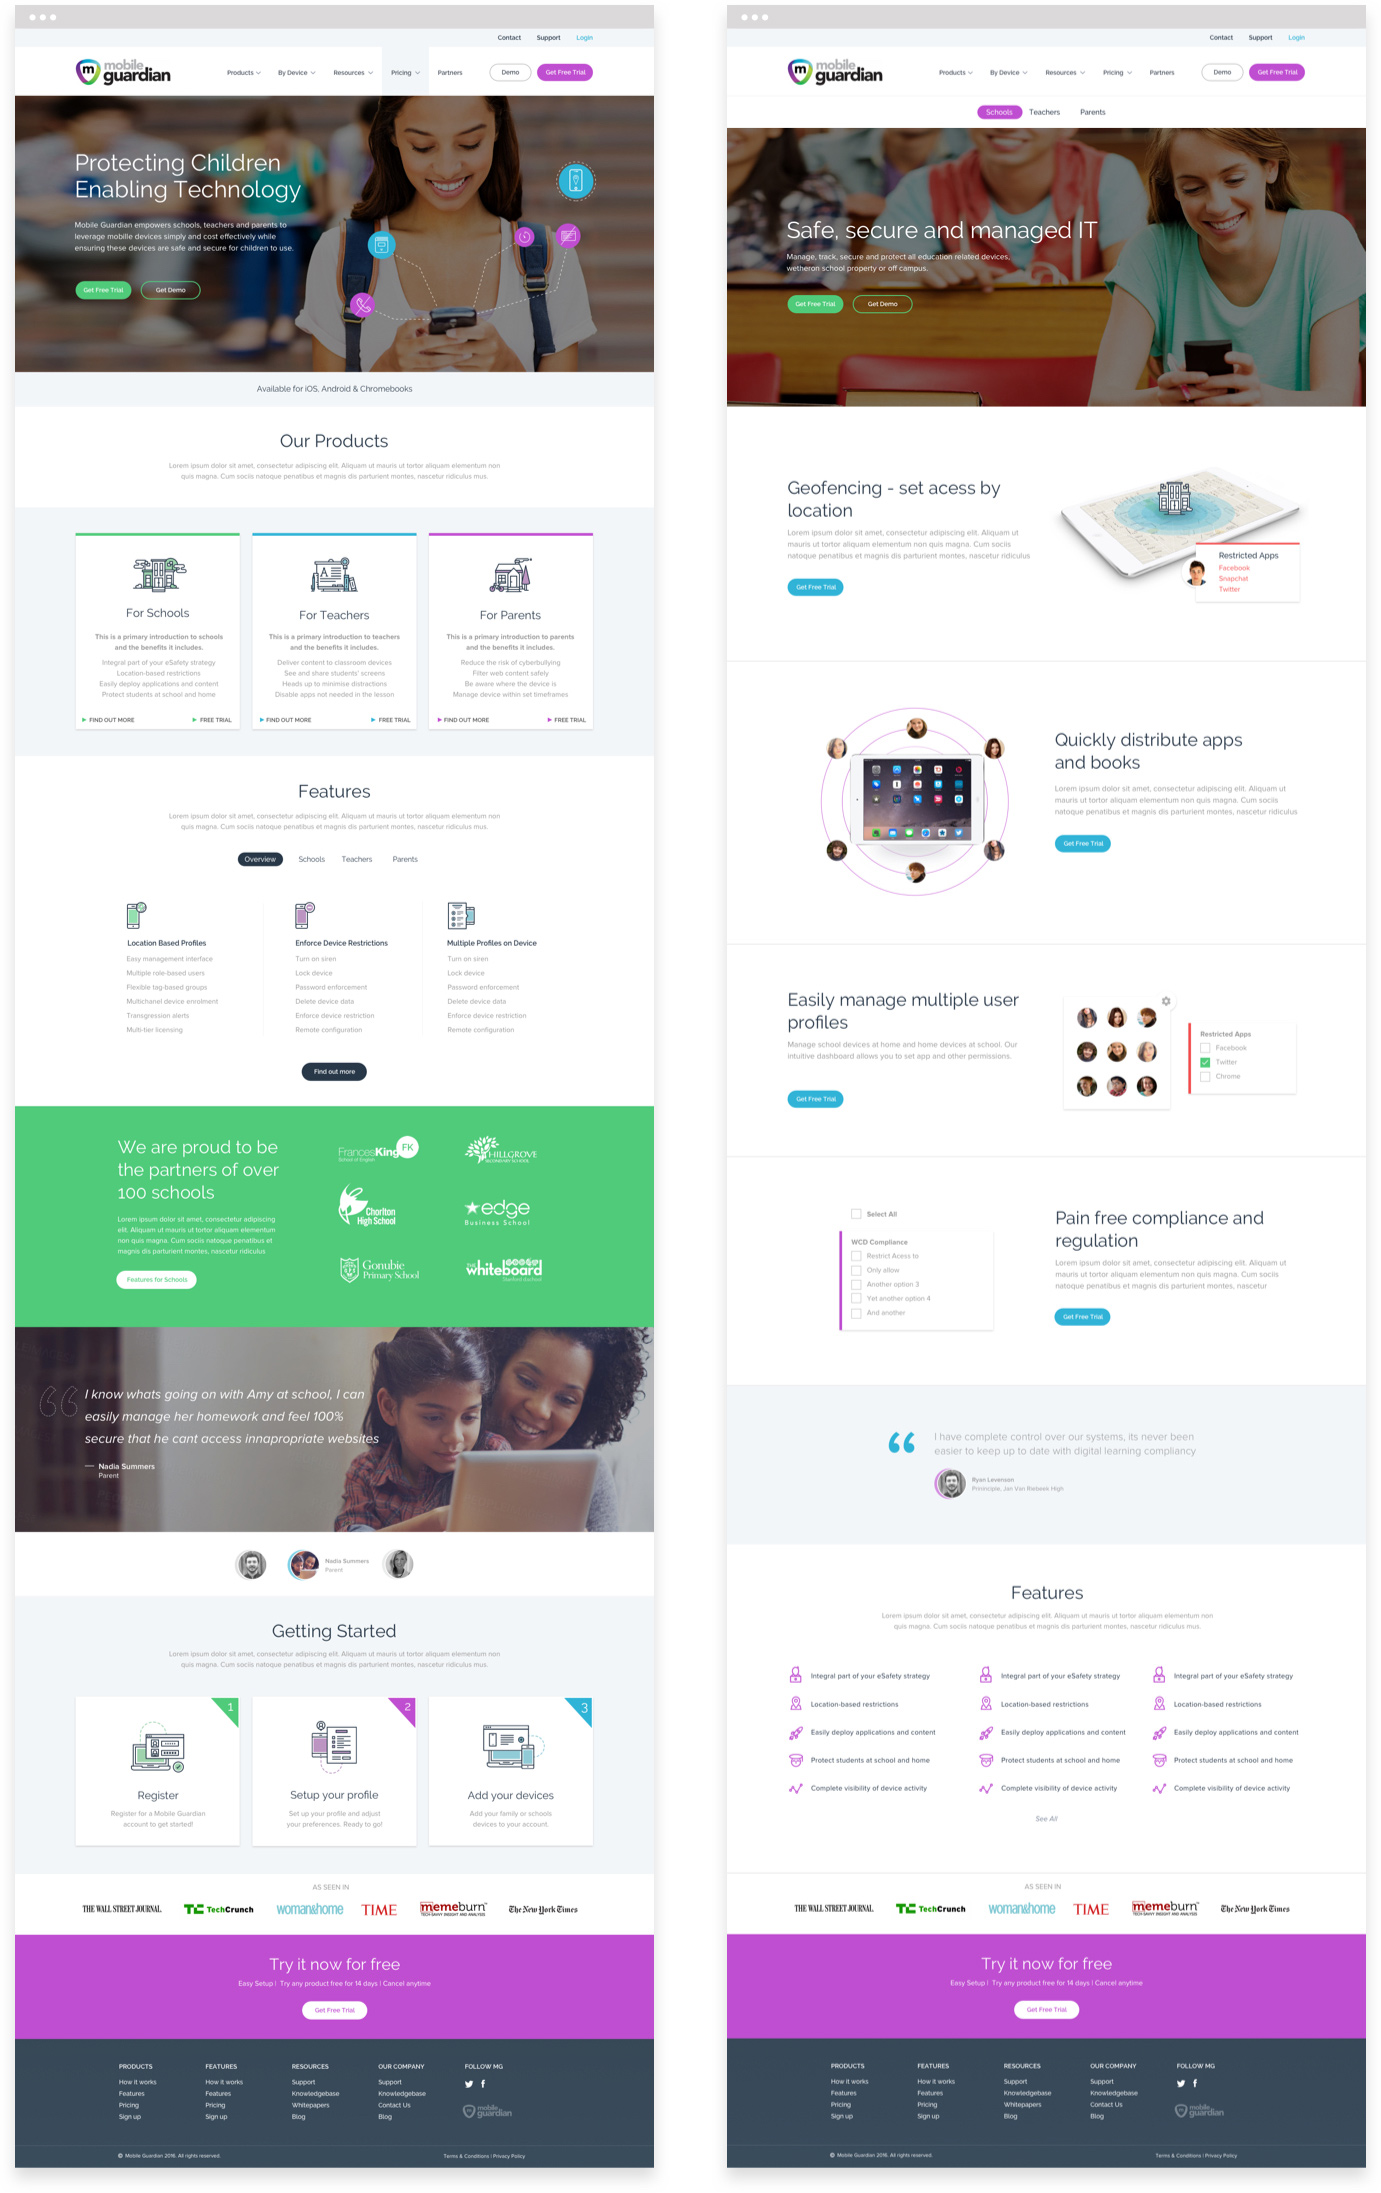 Mobile Guardian Designs For Website